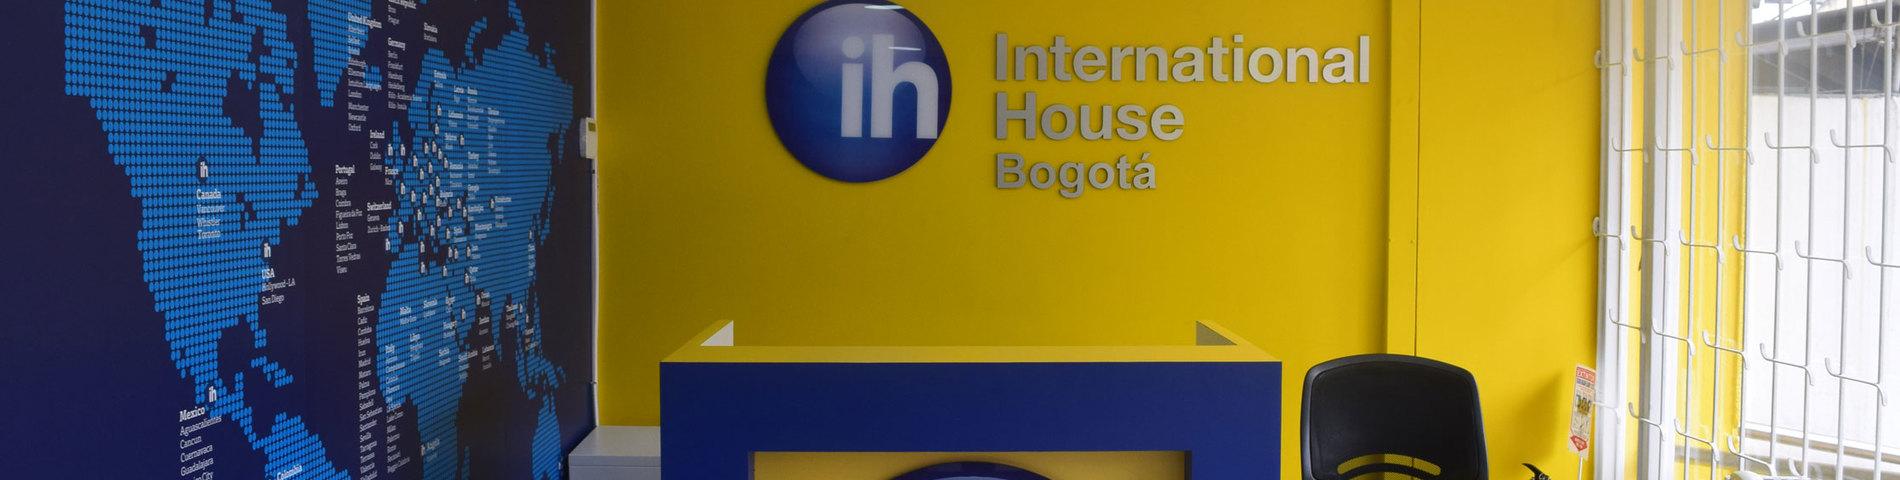 International House Bogota bilde 1